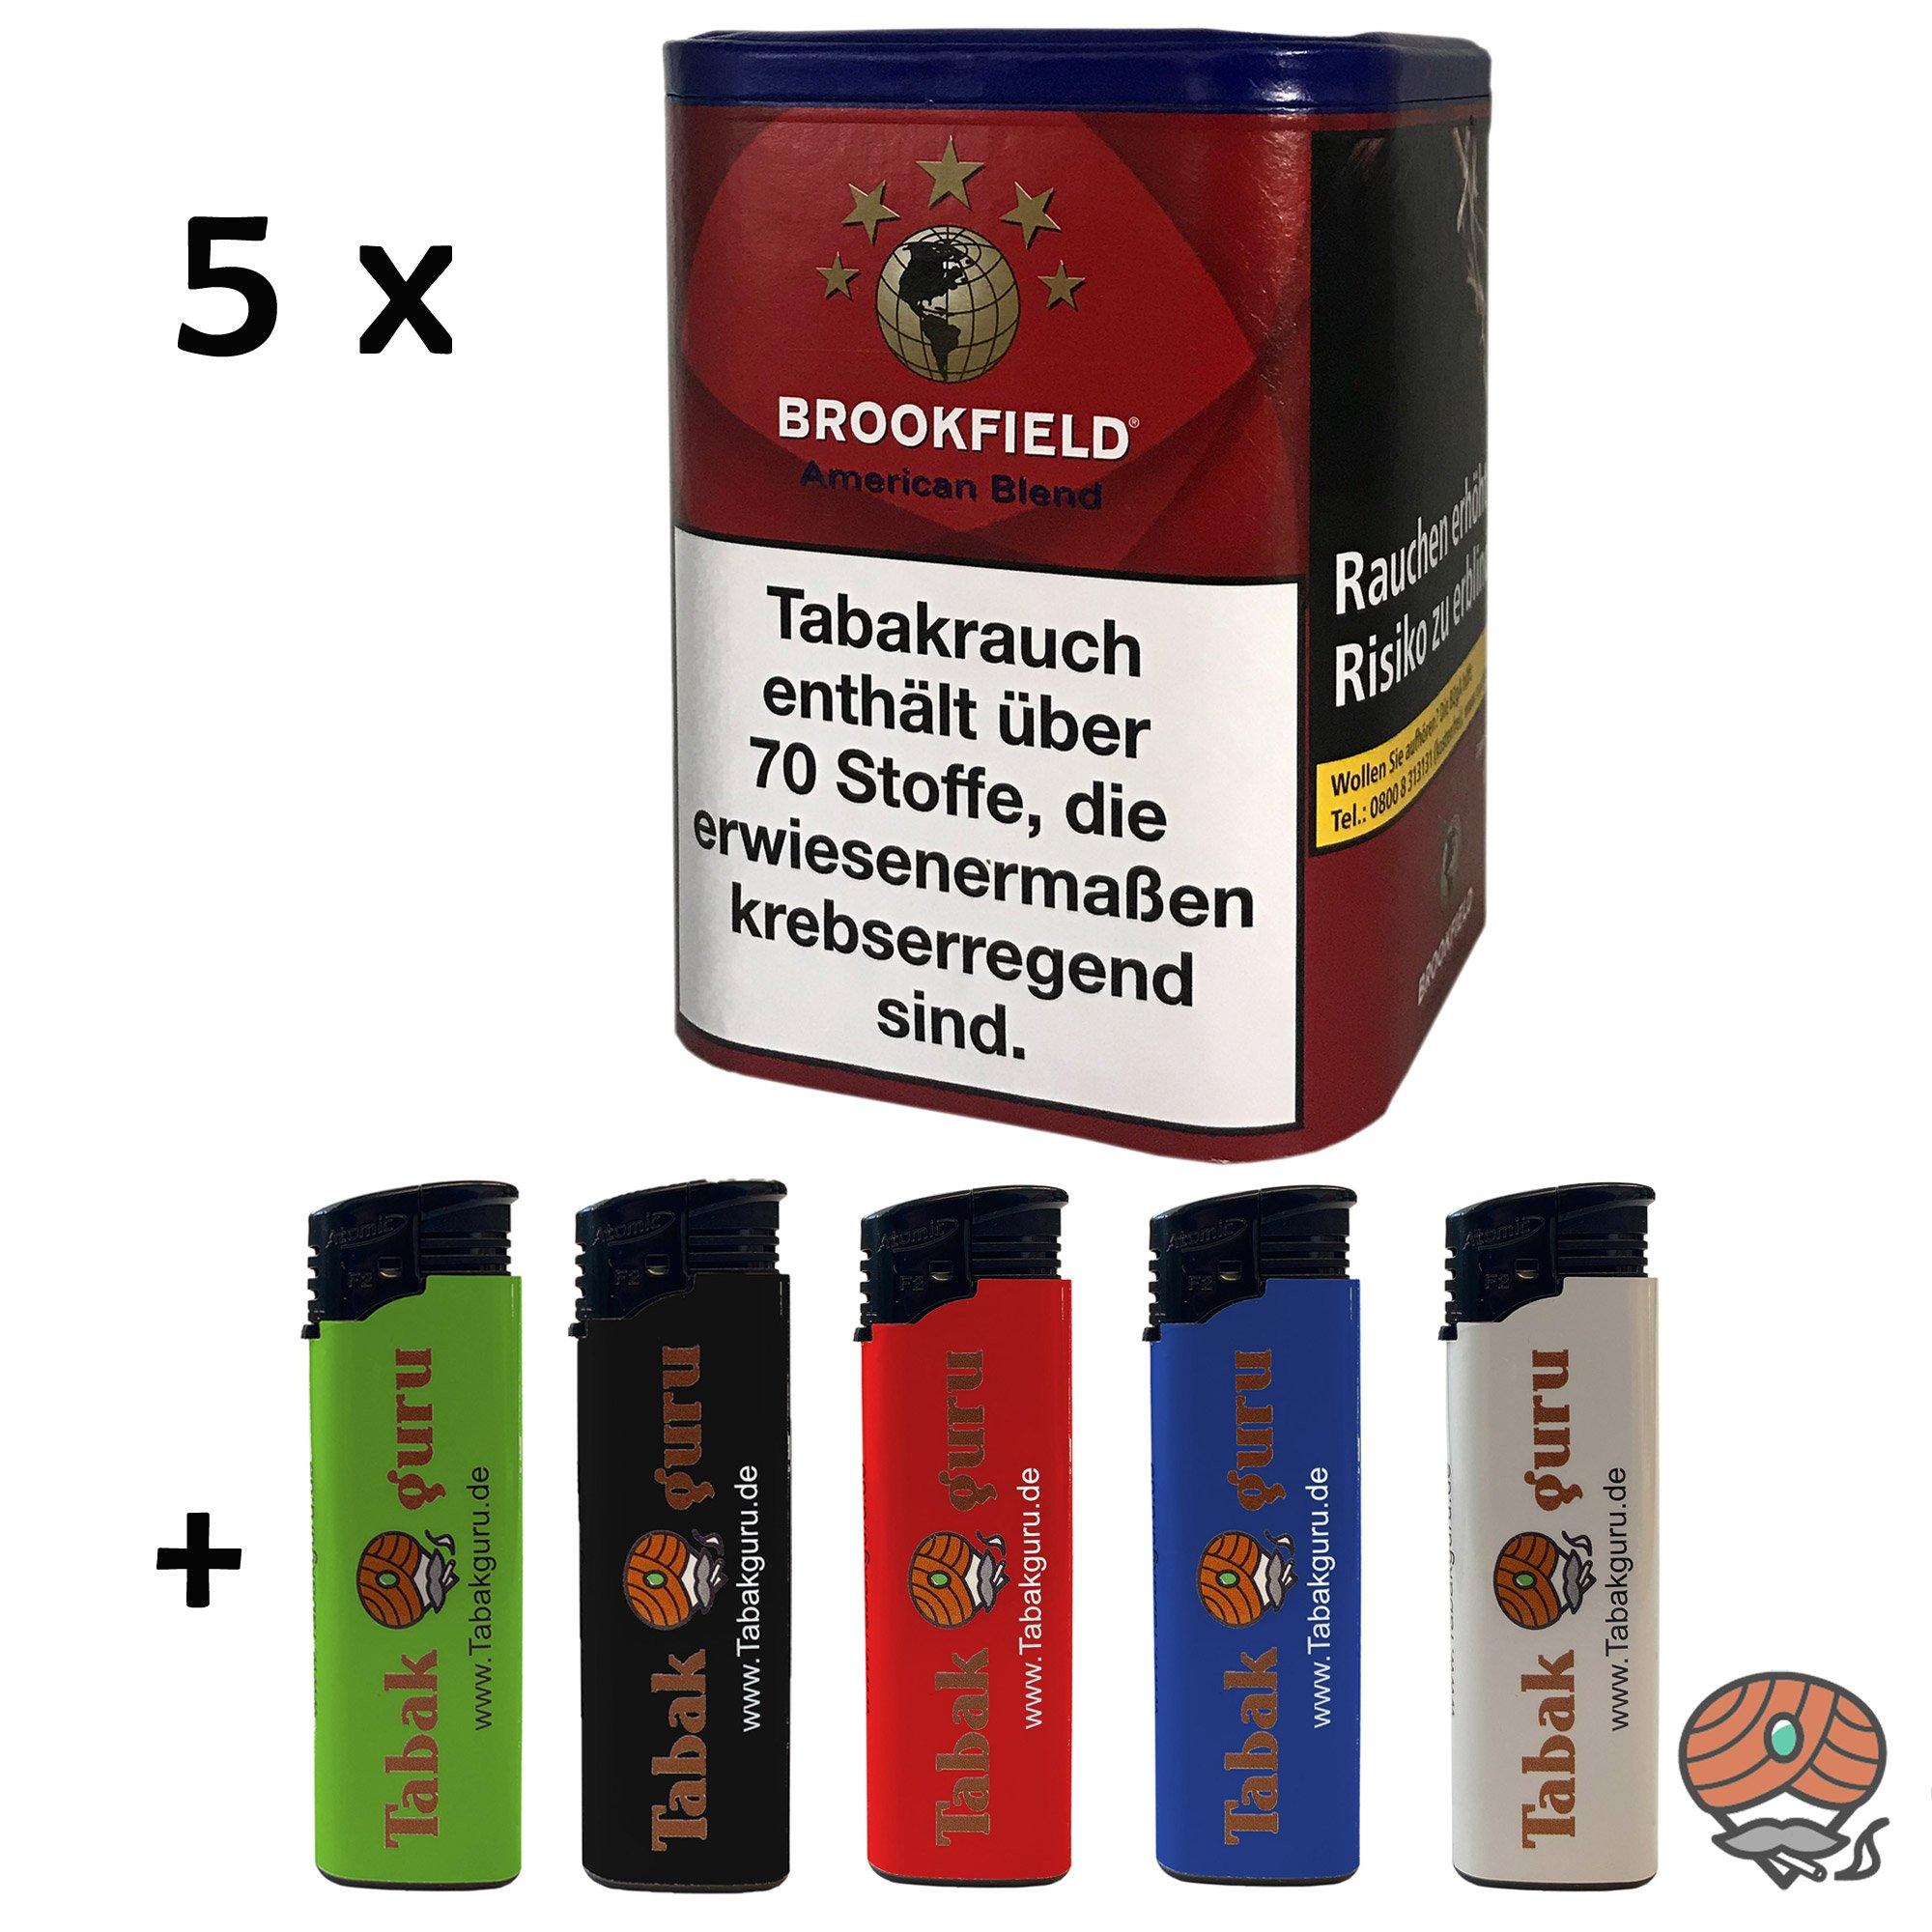 5x Brookfield American Blend Feinschnittabak à 120g + Zubehör